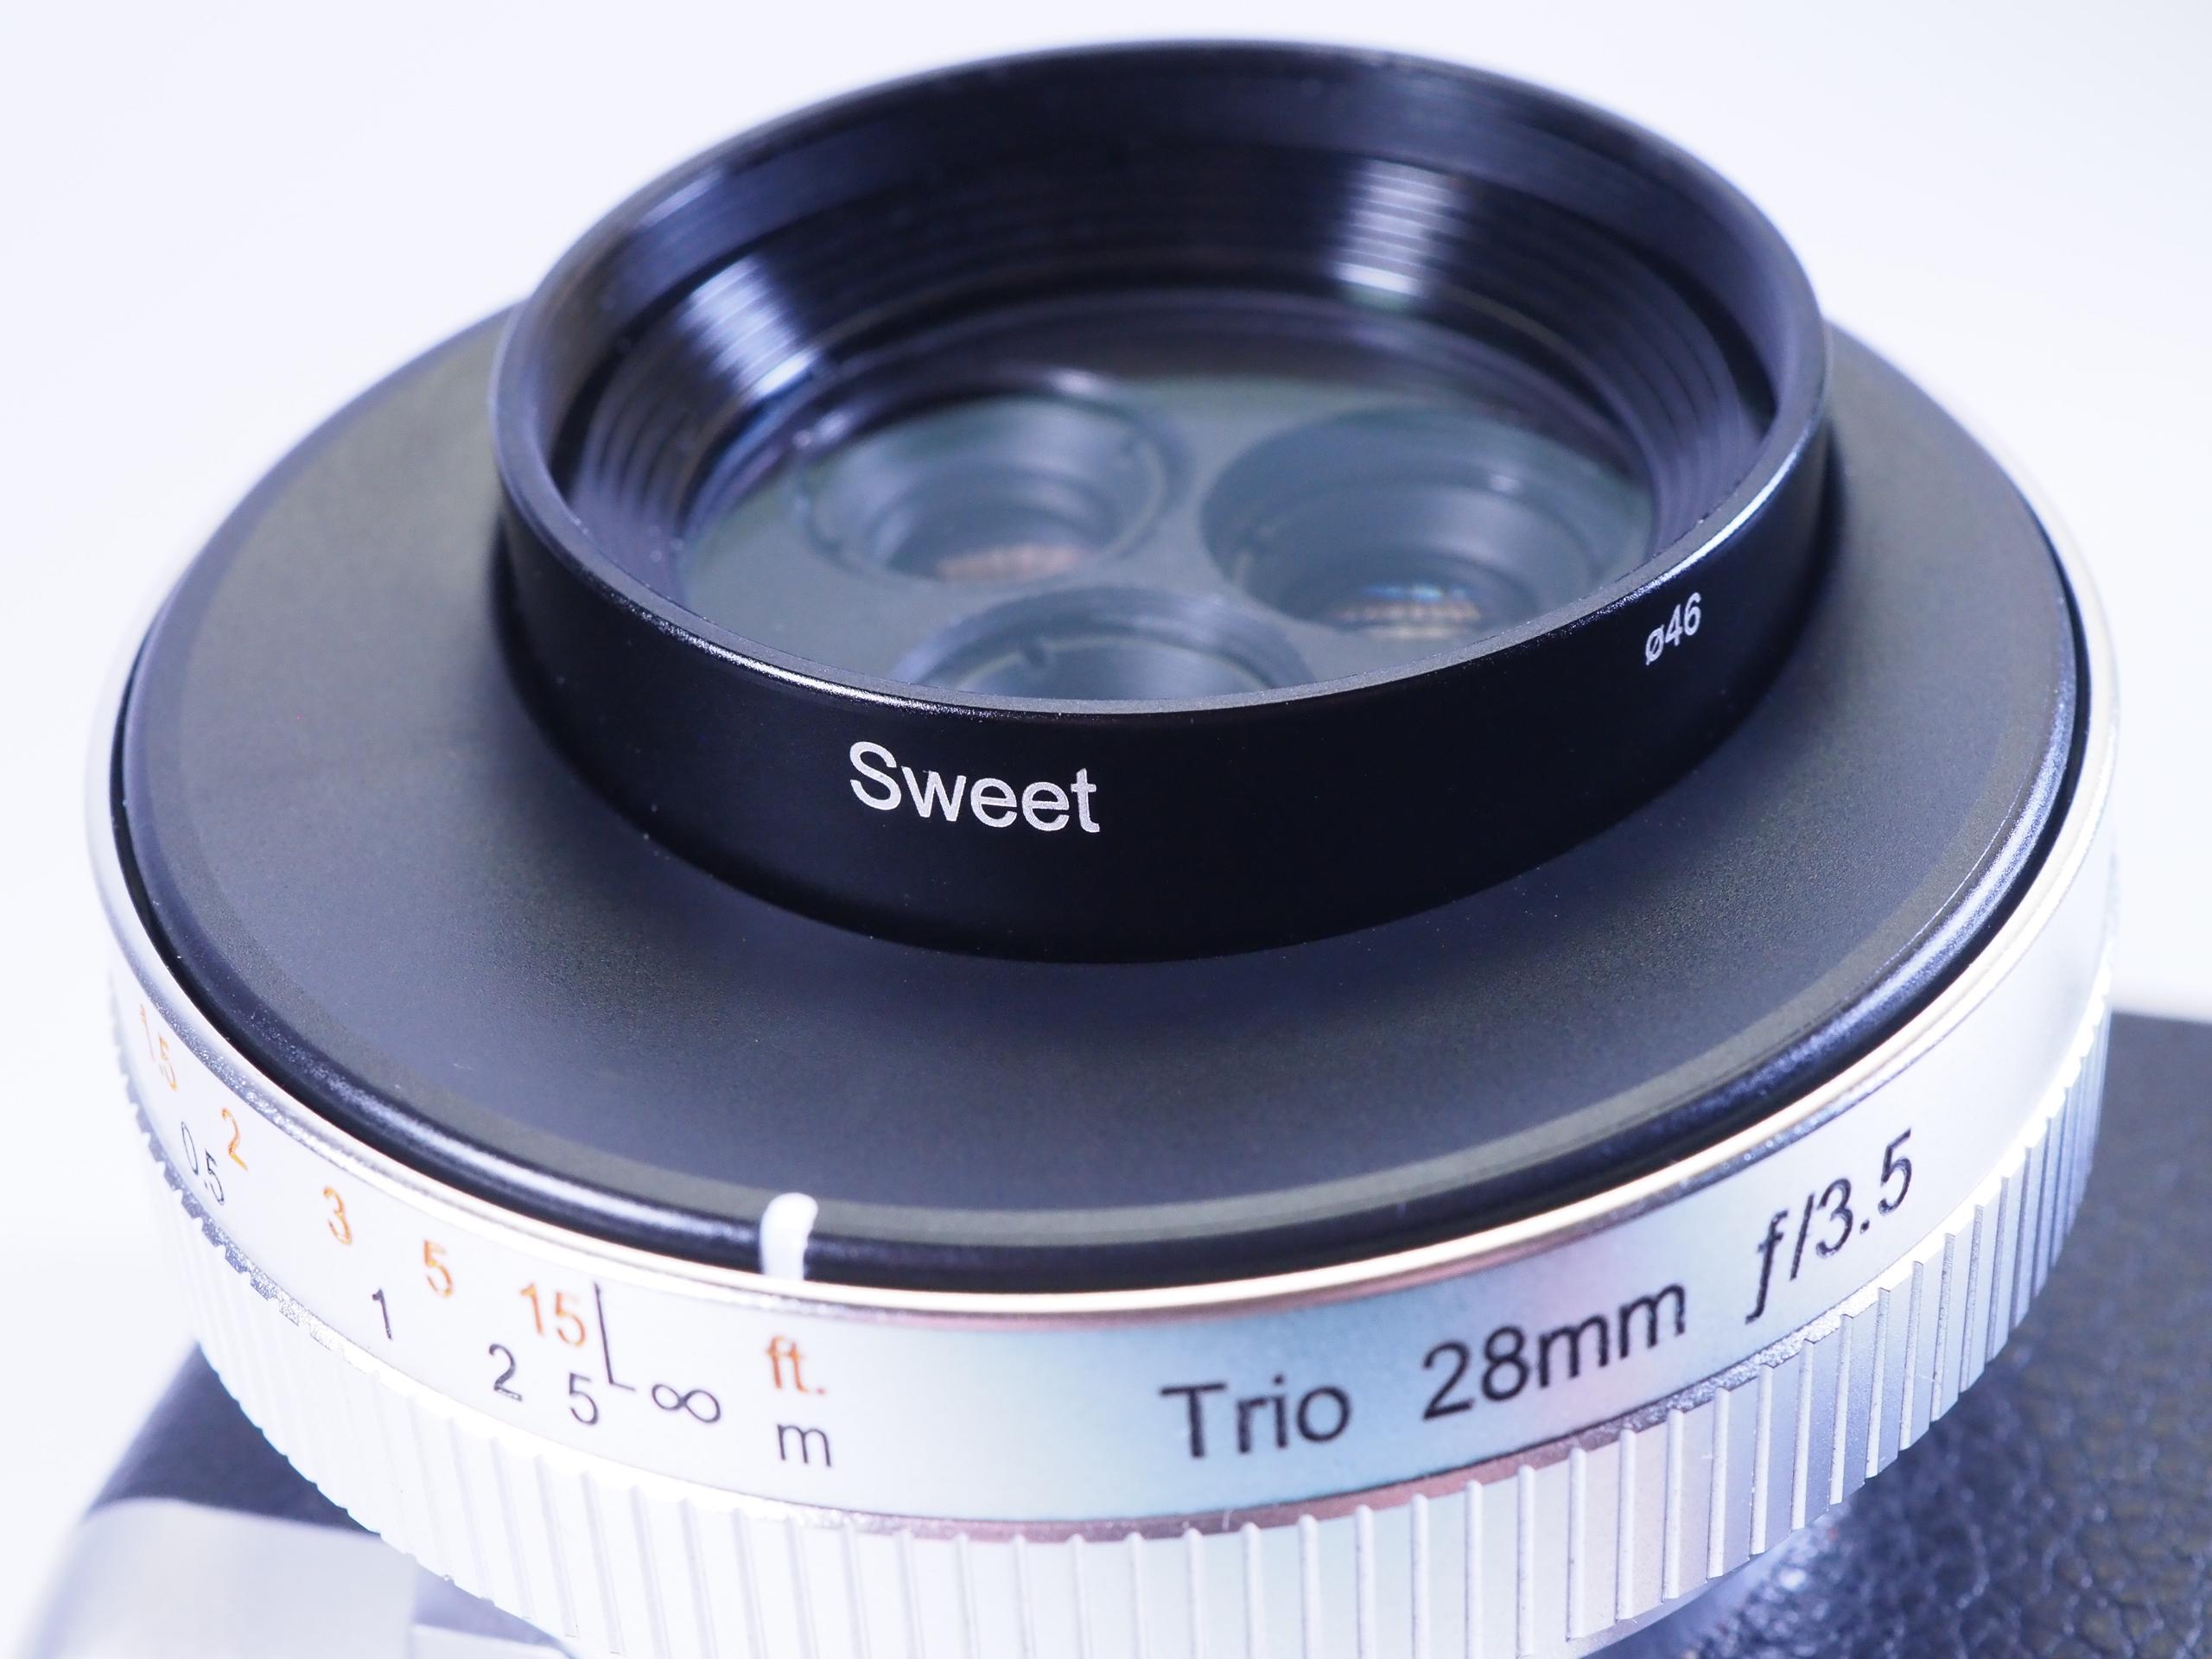 Lensbaby_Trio_28mm_f3-5